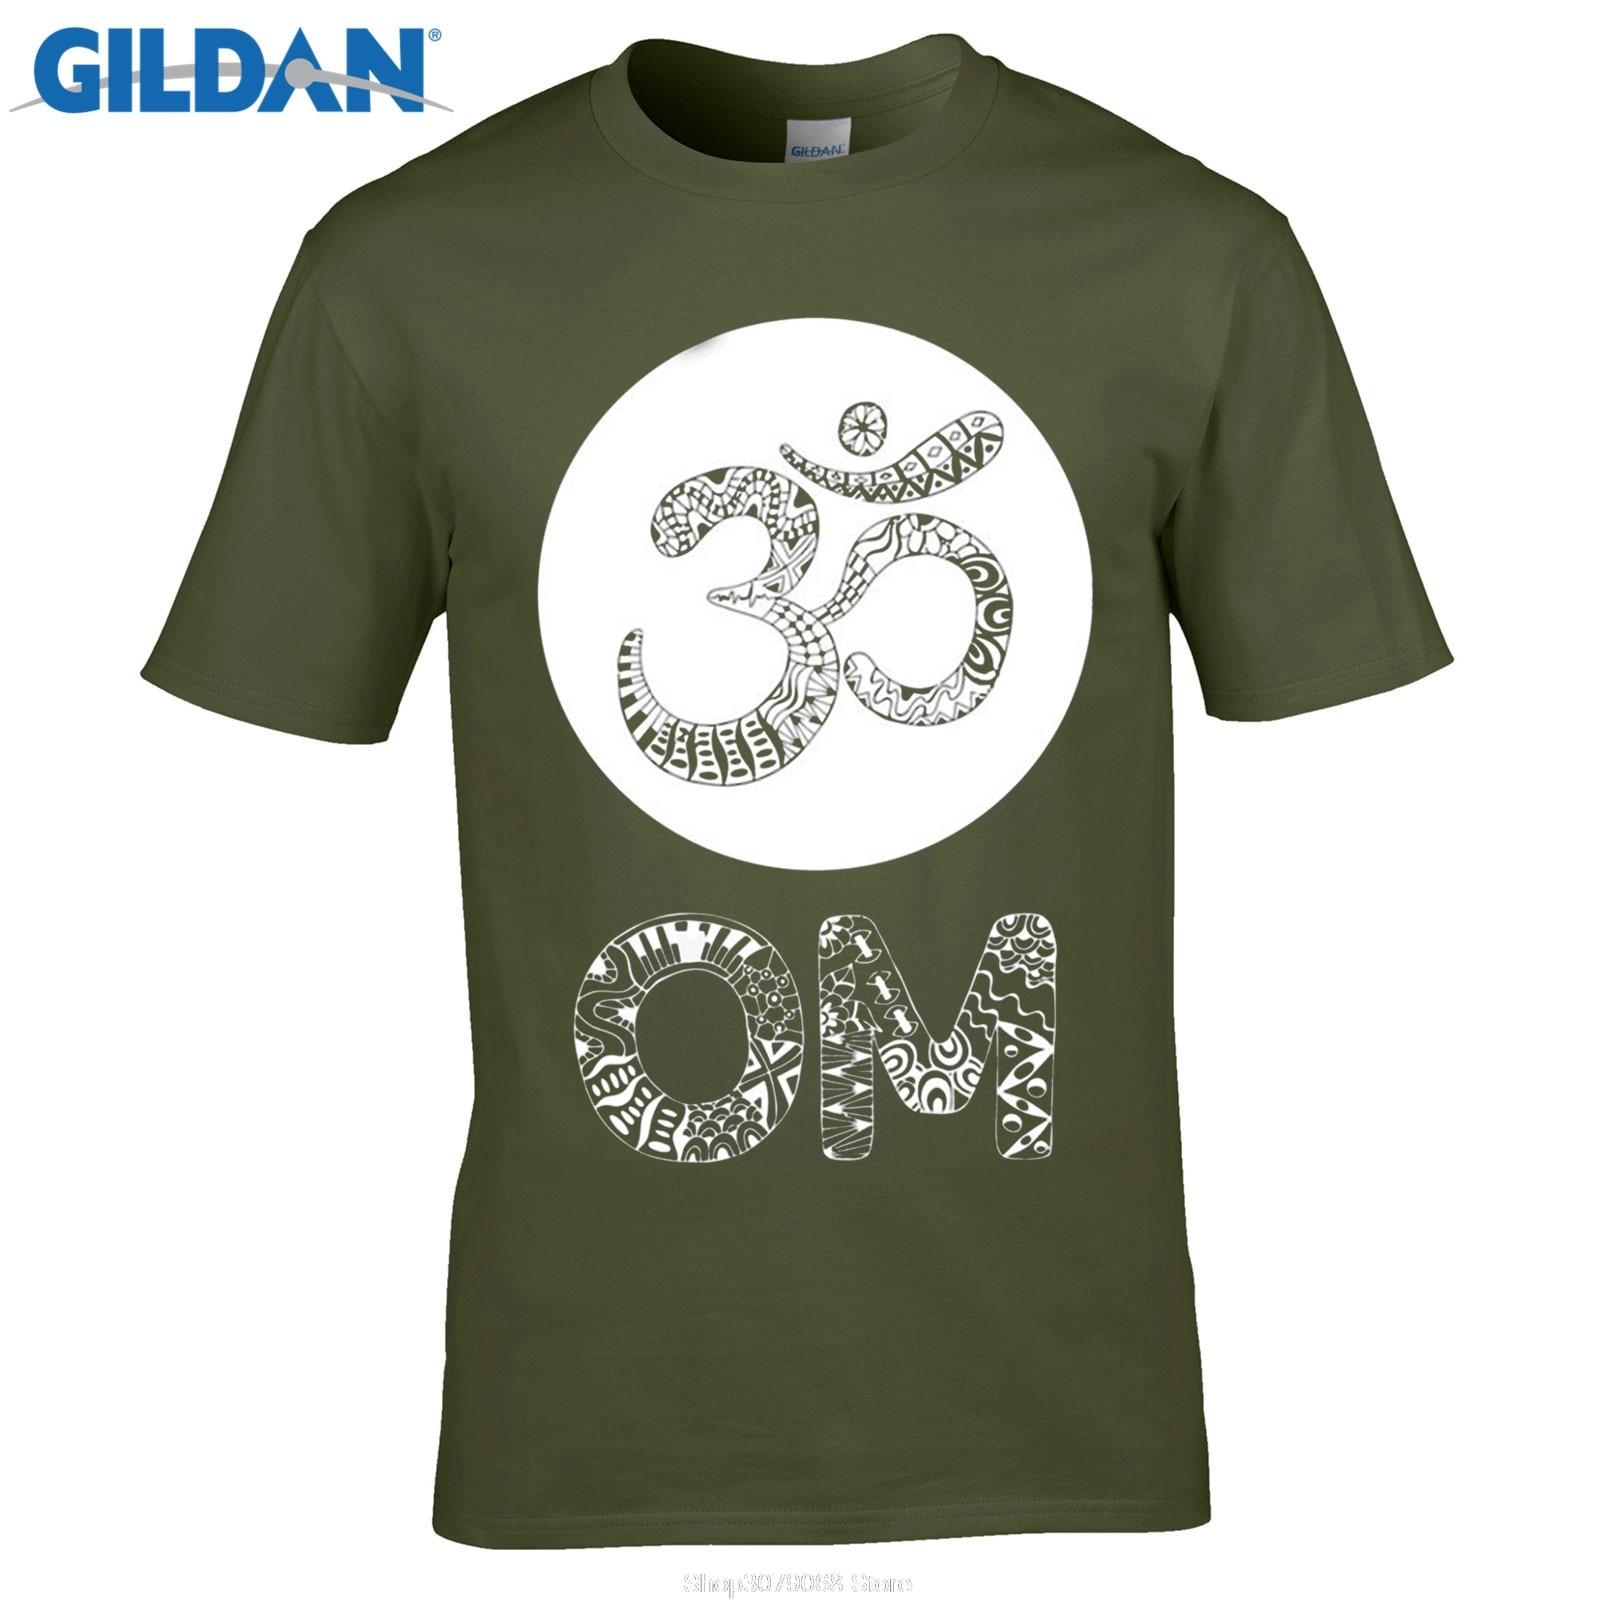 Design t shirt gildan - Gildan Designer T Shirt Streetwear Tees Yogaer Aum Om Ohm India Symbol Burnout Racerback T